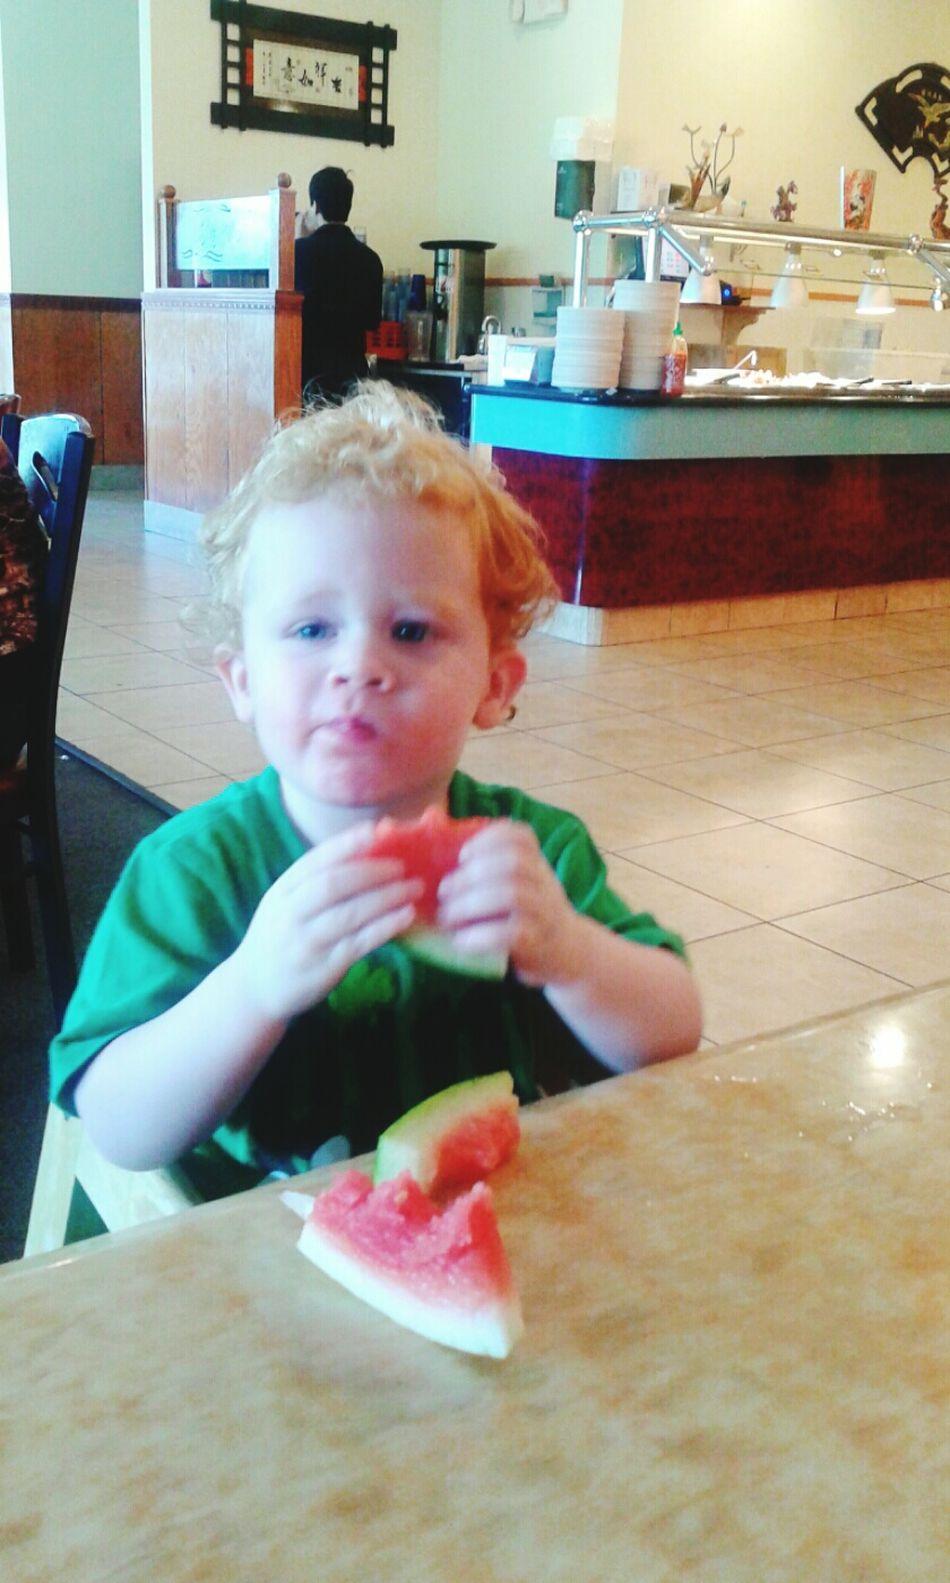 Taking Photos Watermelon🍉 OpenEdit My Grandson Grandson Redhead Family Cute Little Dirty Face. ;) Cutie Enjoying Life